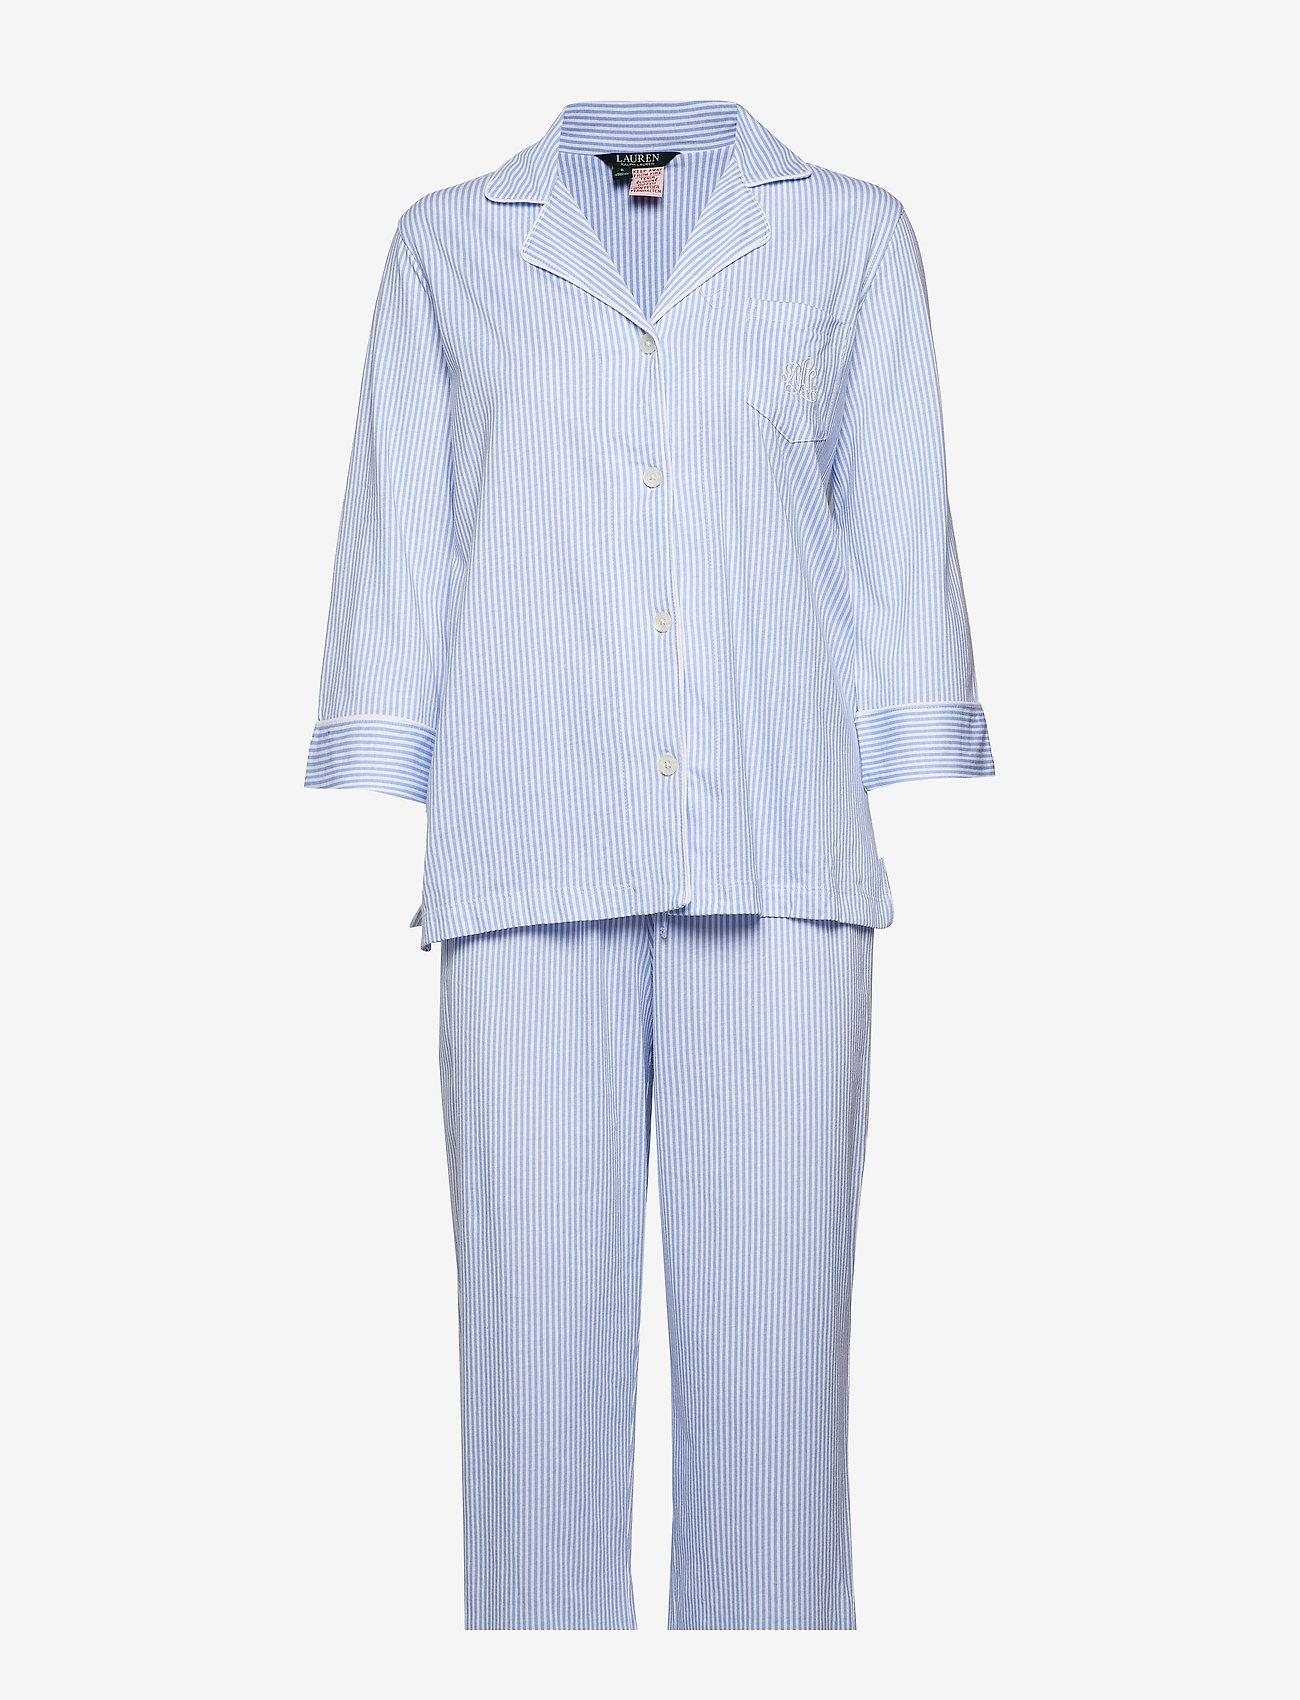 Lauren Ralph Lauren Homewear - LRL HERITAGE 3/4 SL CLASSIC NOTCH PJ SET - pyjama''s - french blue/white stripe - 0